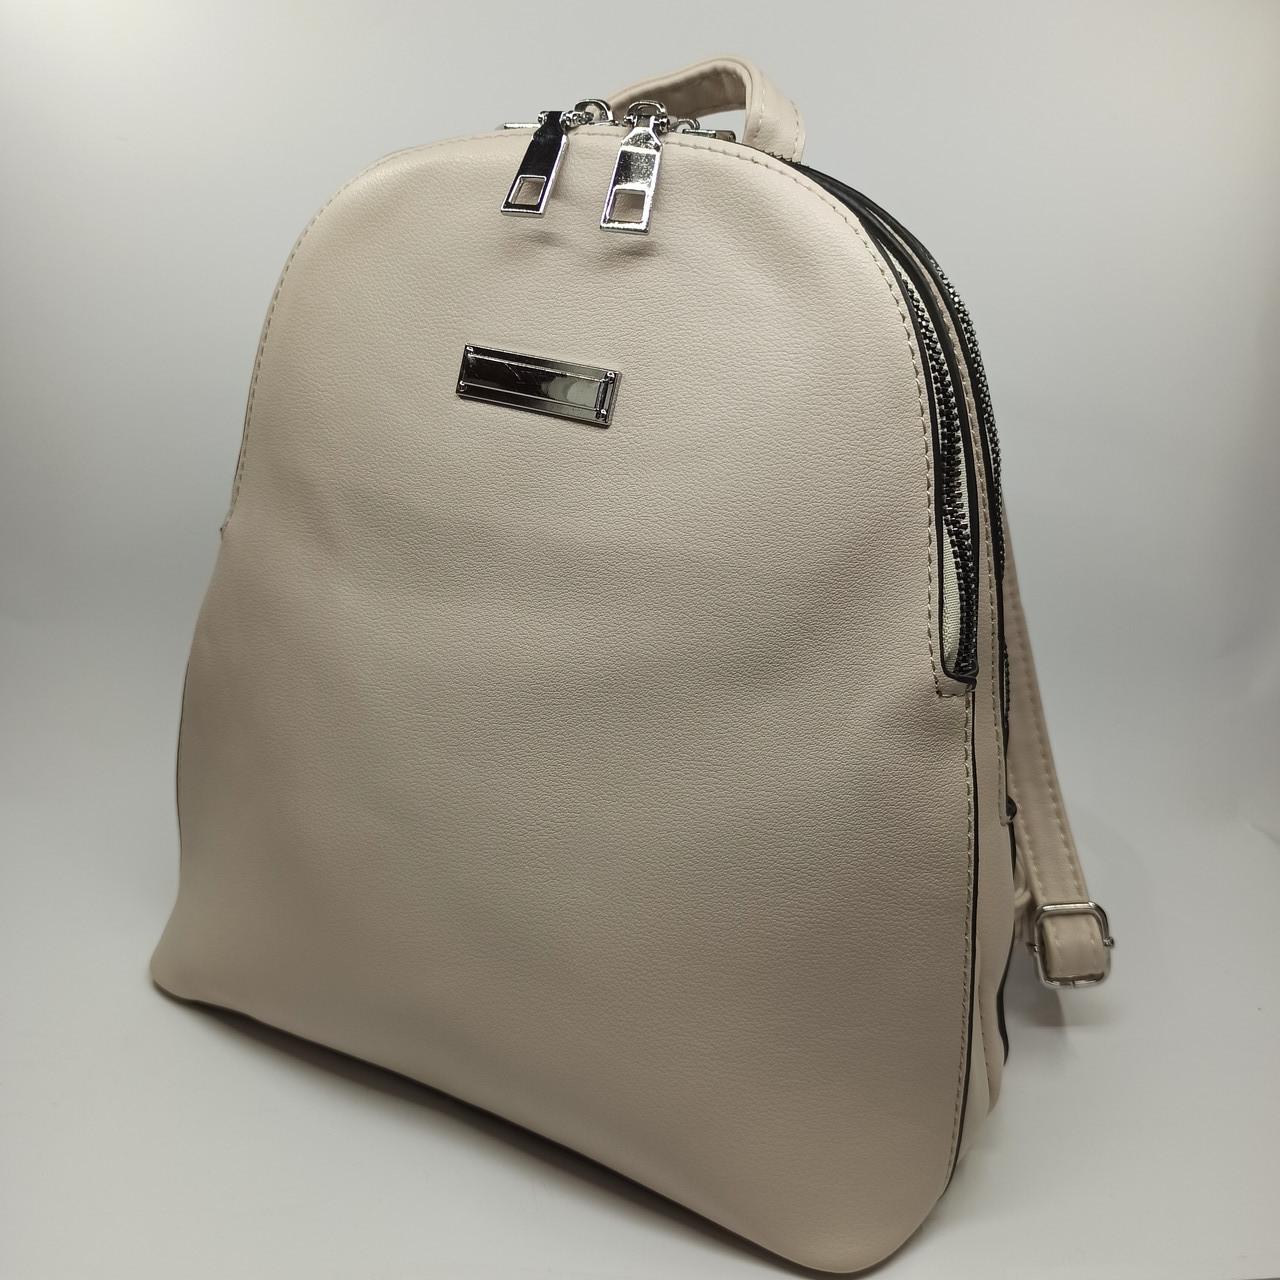 Жіночий рюкзак / Женский рюкзак 18580